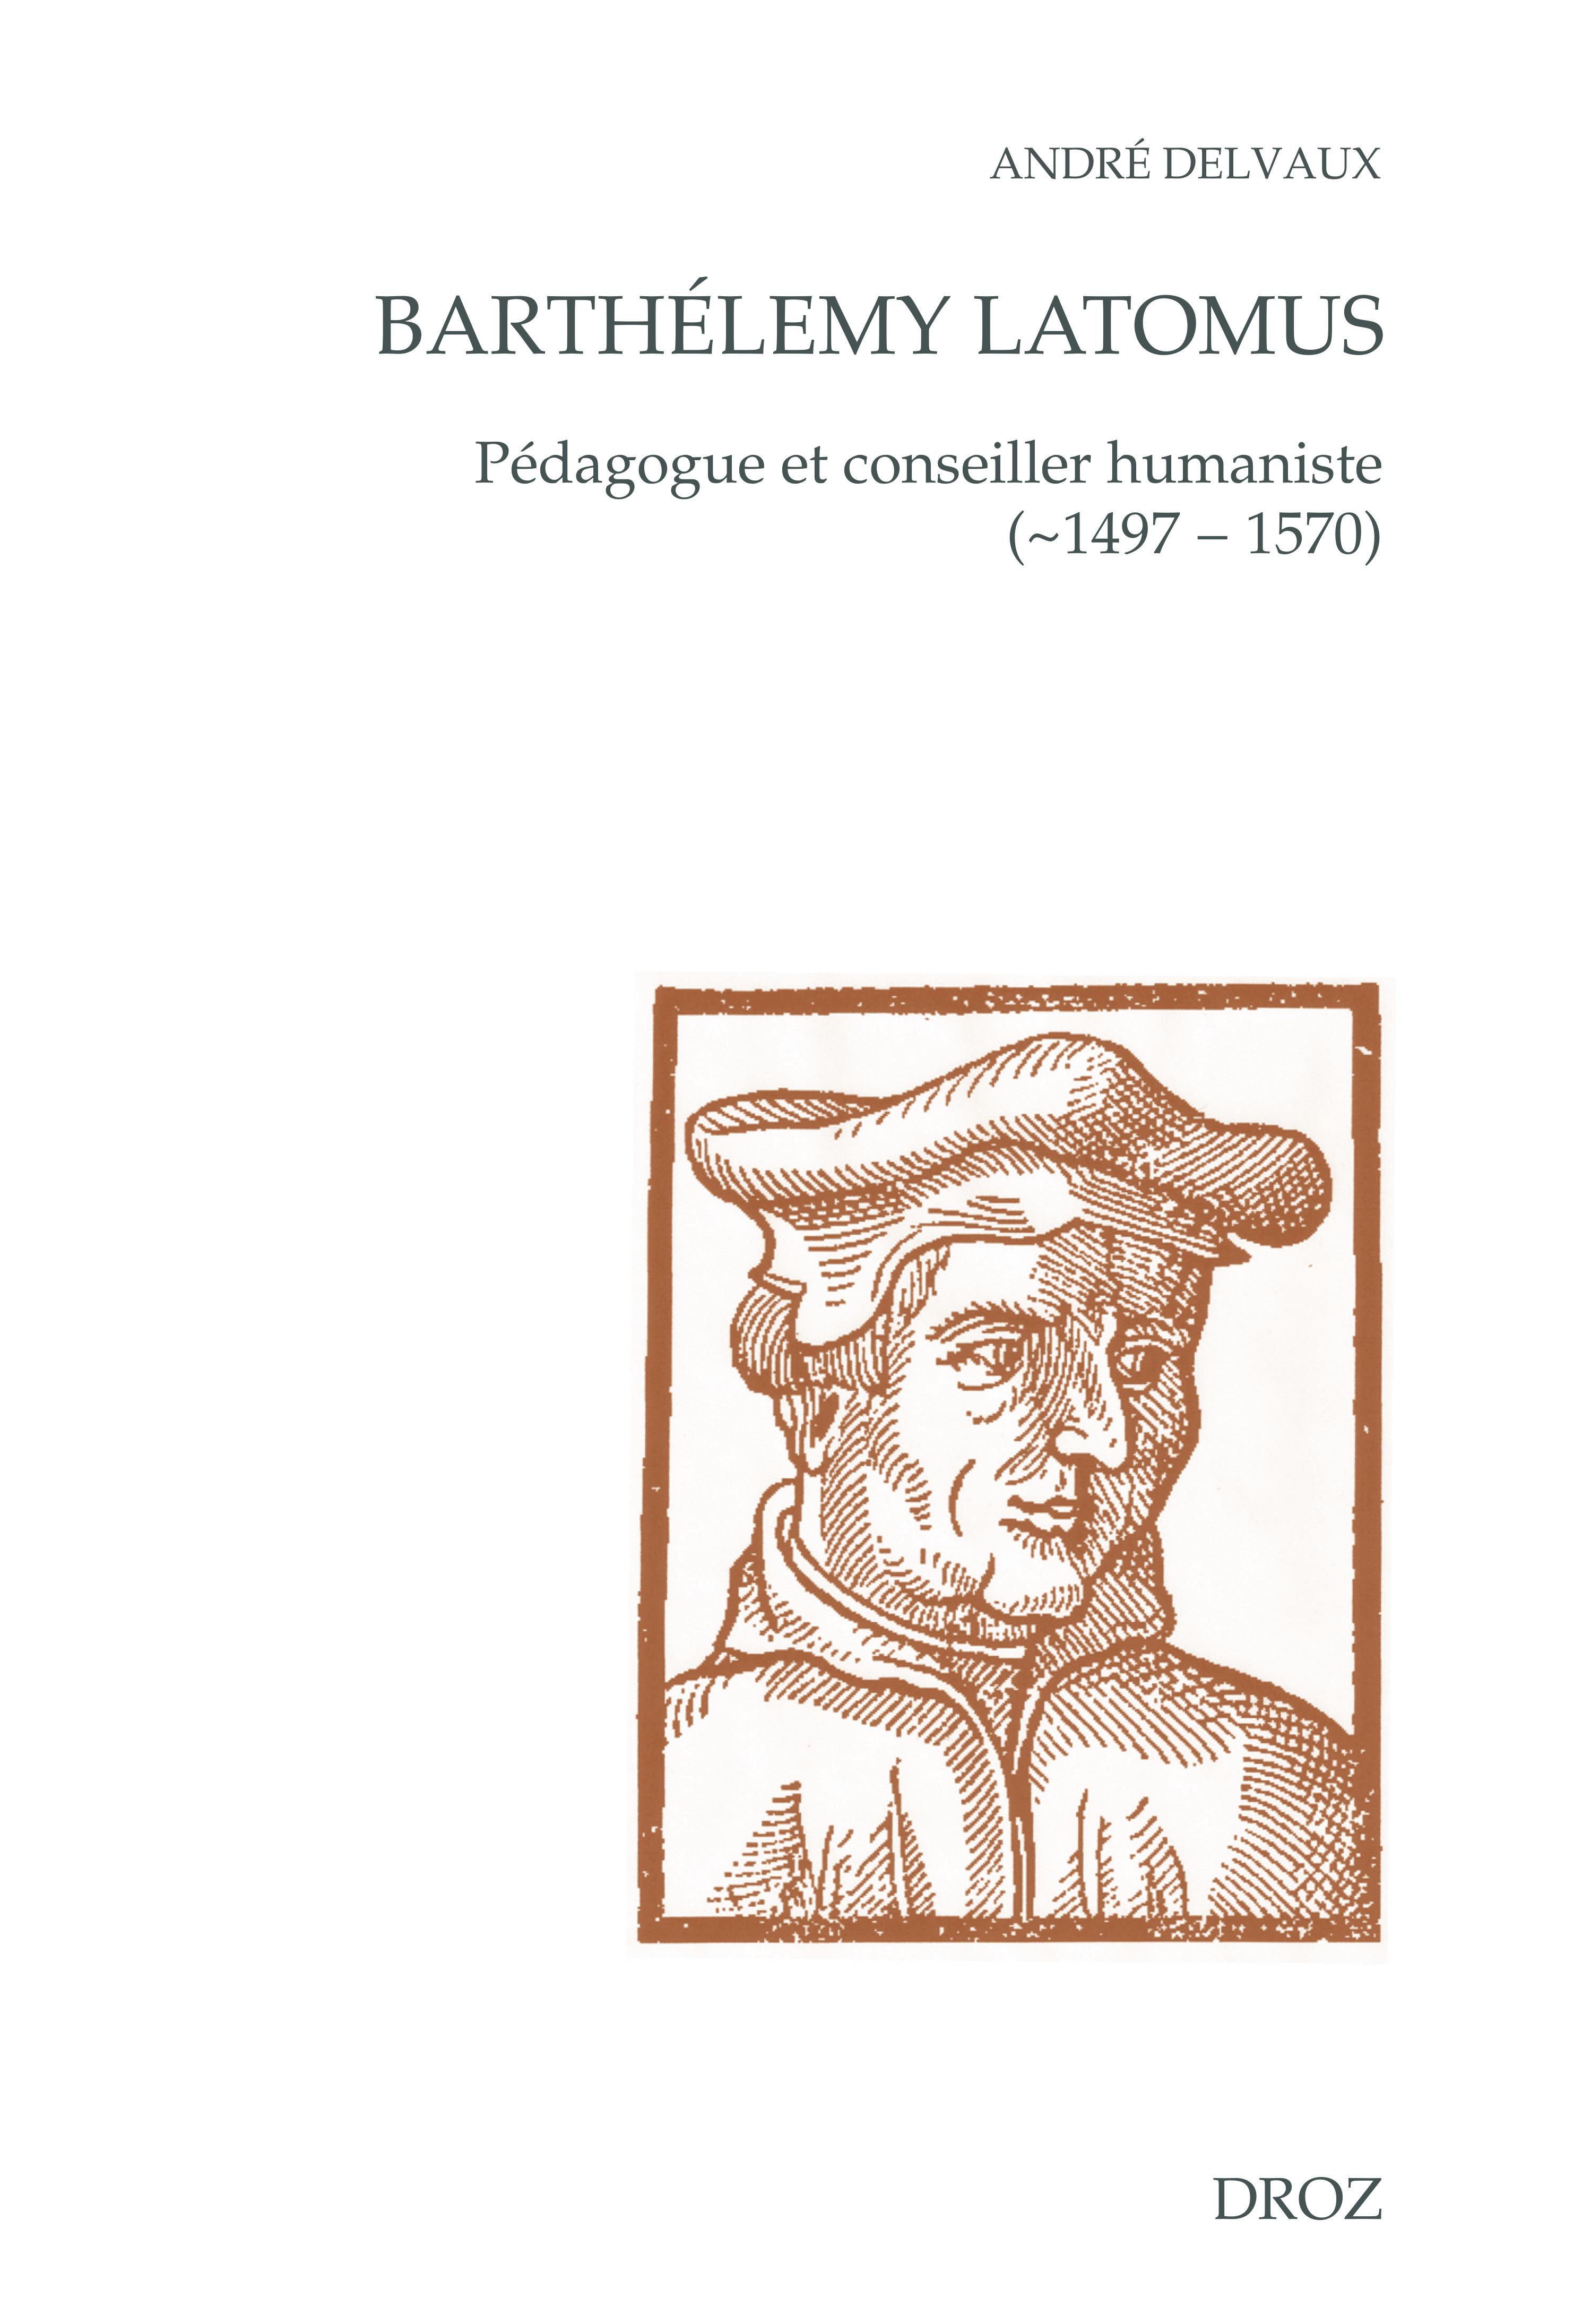 Barthelemy latomus, pedagogue et conseiller humaniste (1497 - 1570)